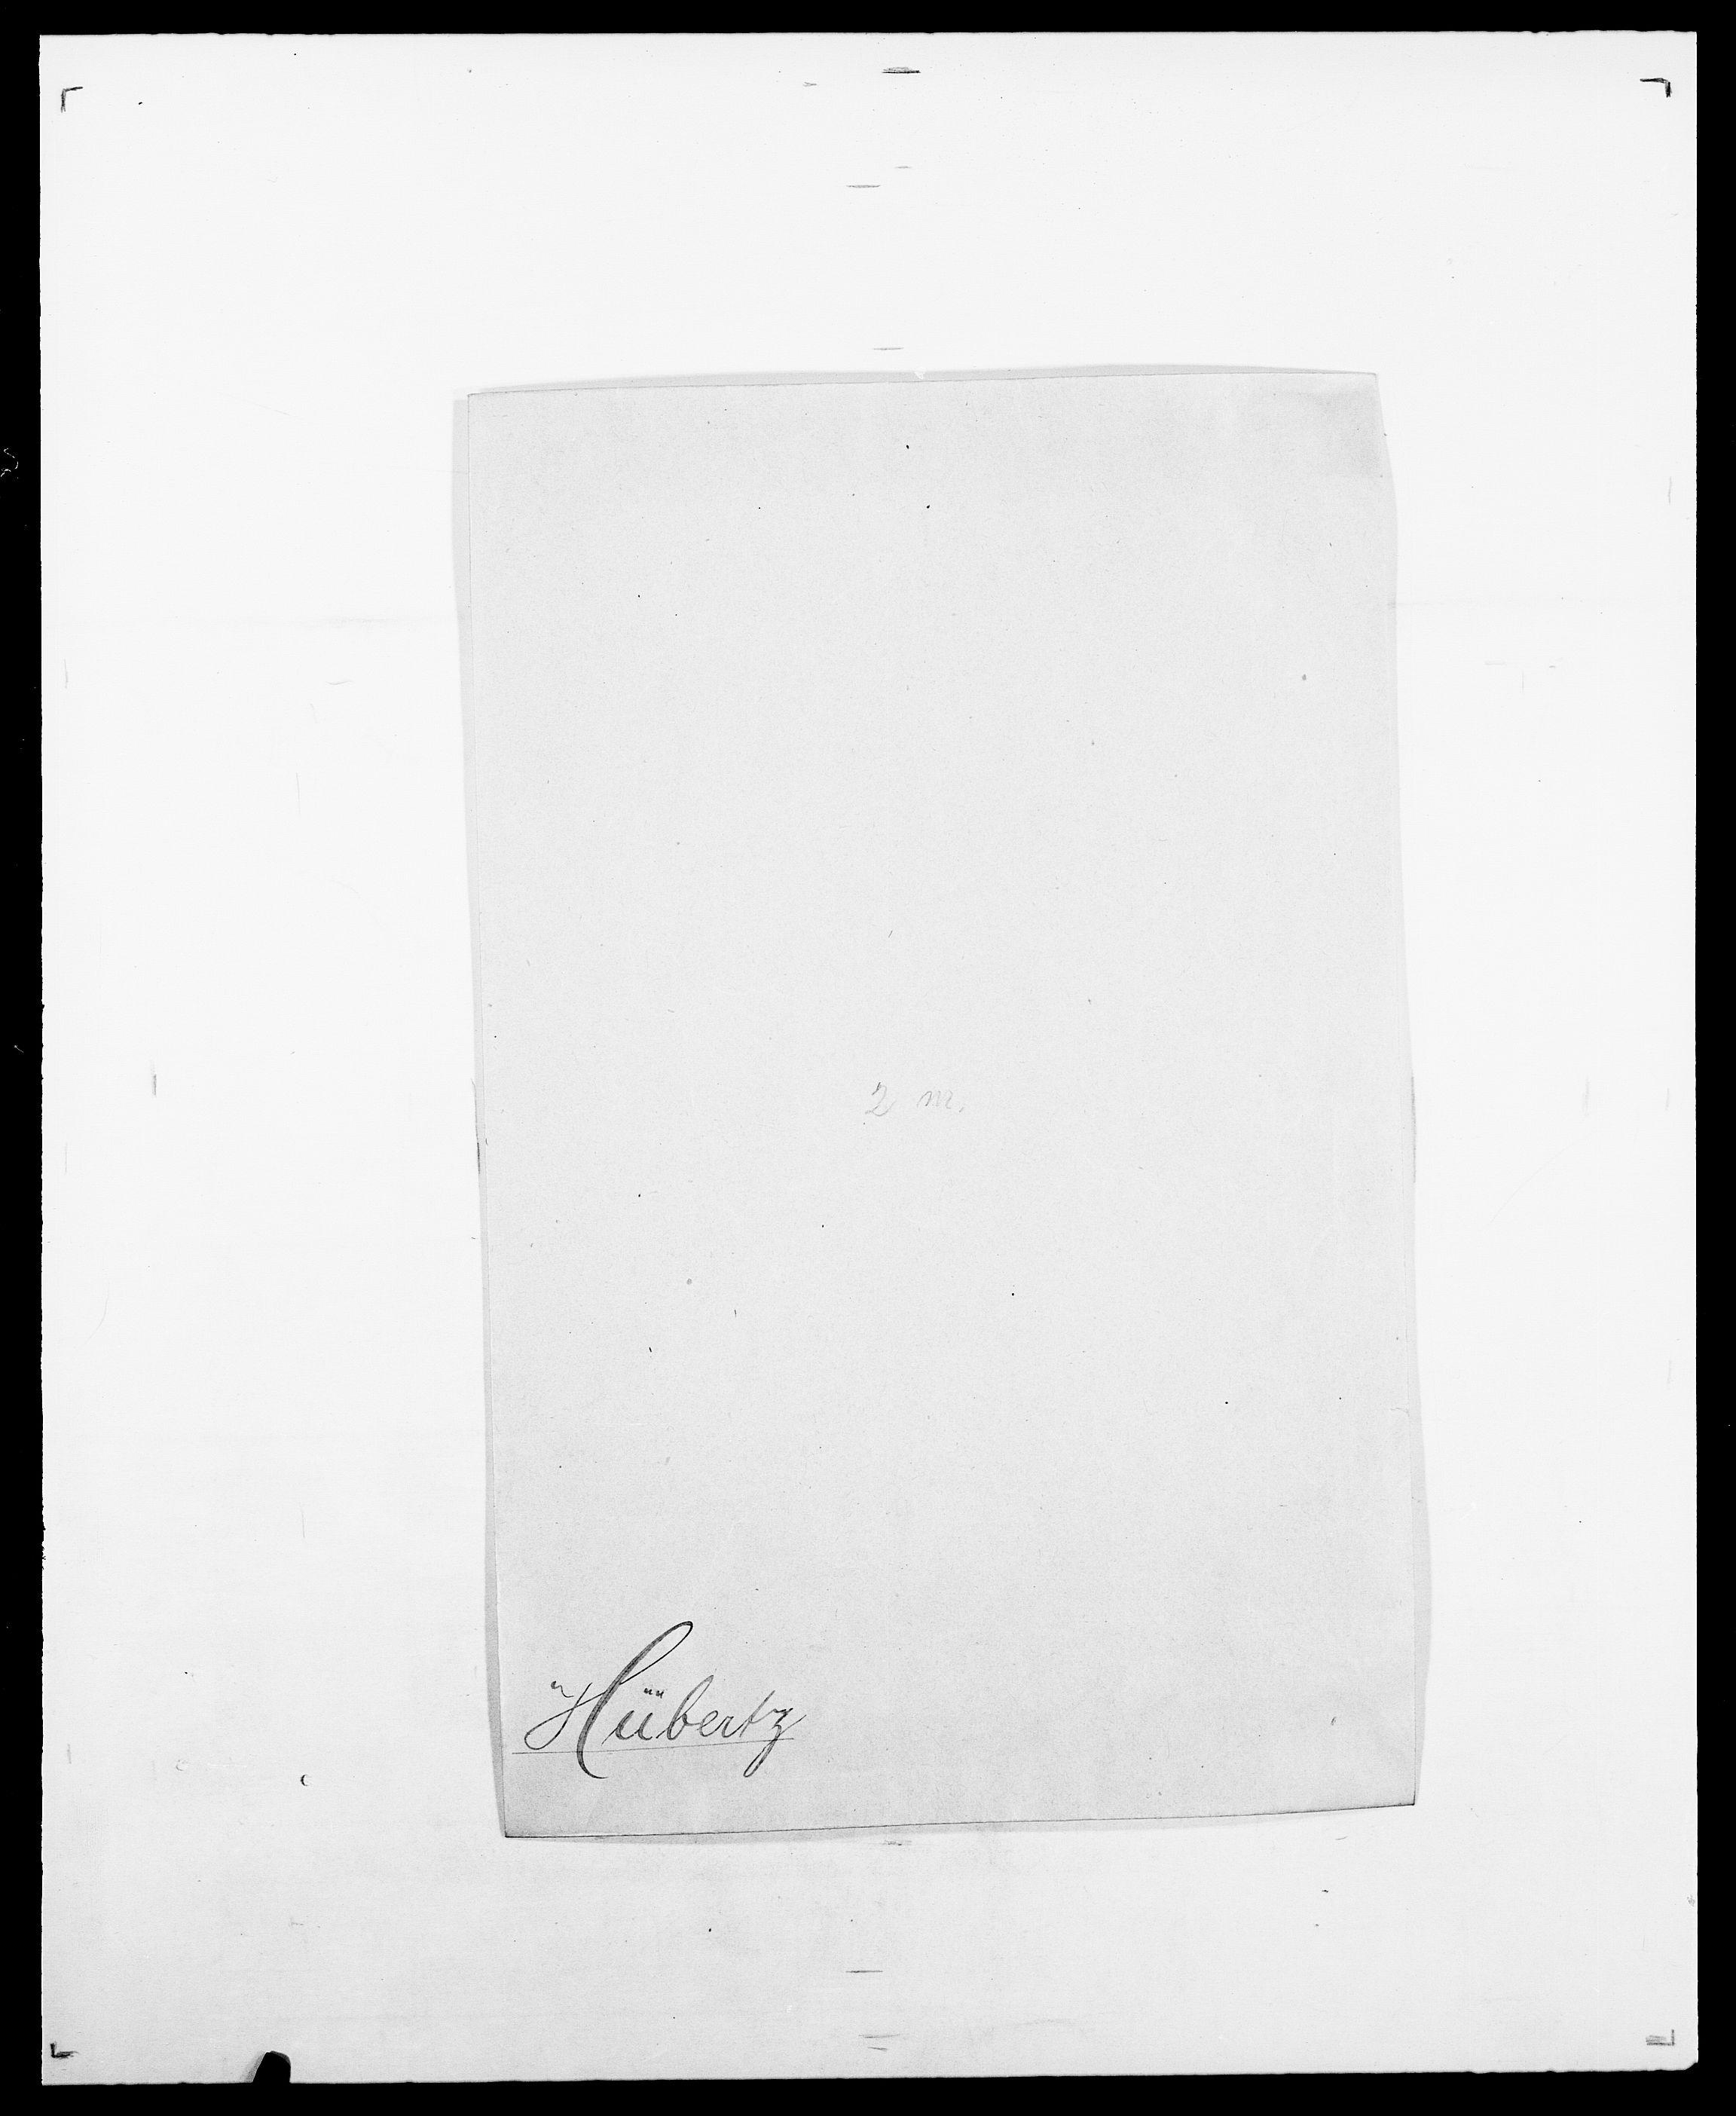 SAO, Delgobe, Charles Antoine - samling, D/Da/L0019: van der Hude - Joys, s. 237